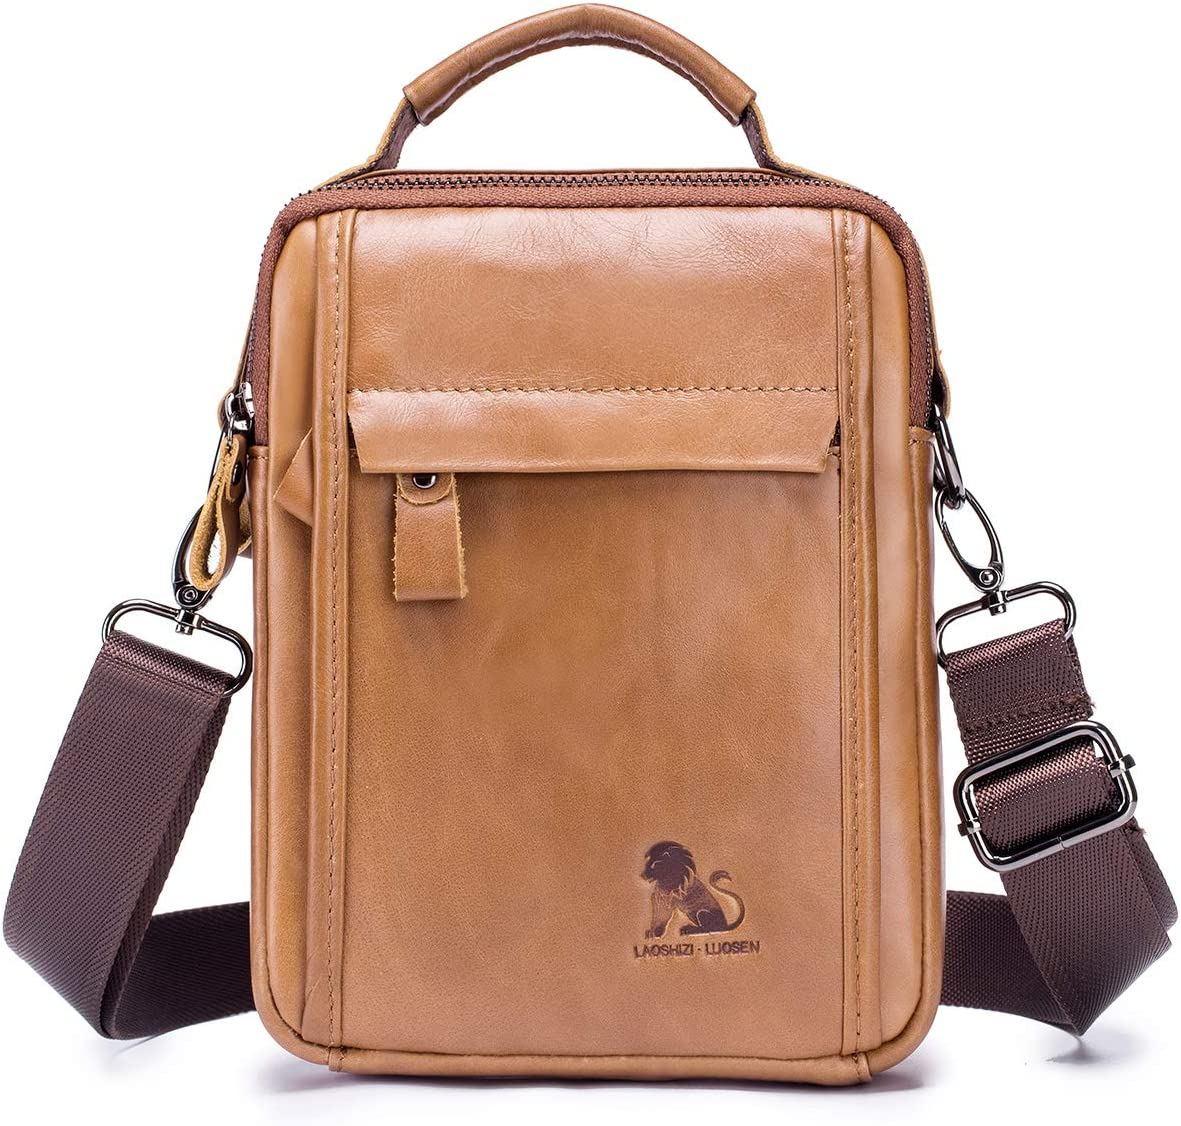 YQSMYSW Casual Mens Bag Canvas Multi-Function Shoulder Messenger Bag Mens Bag Small Bag